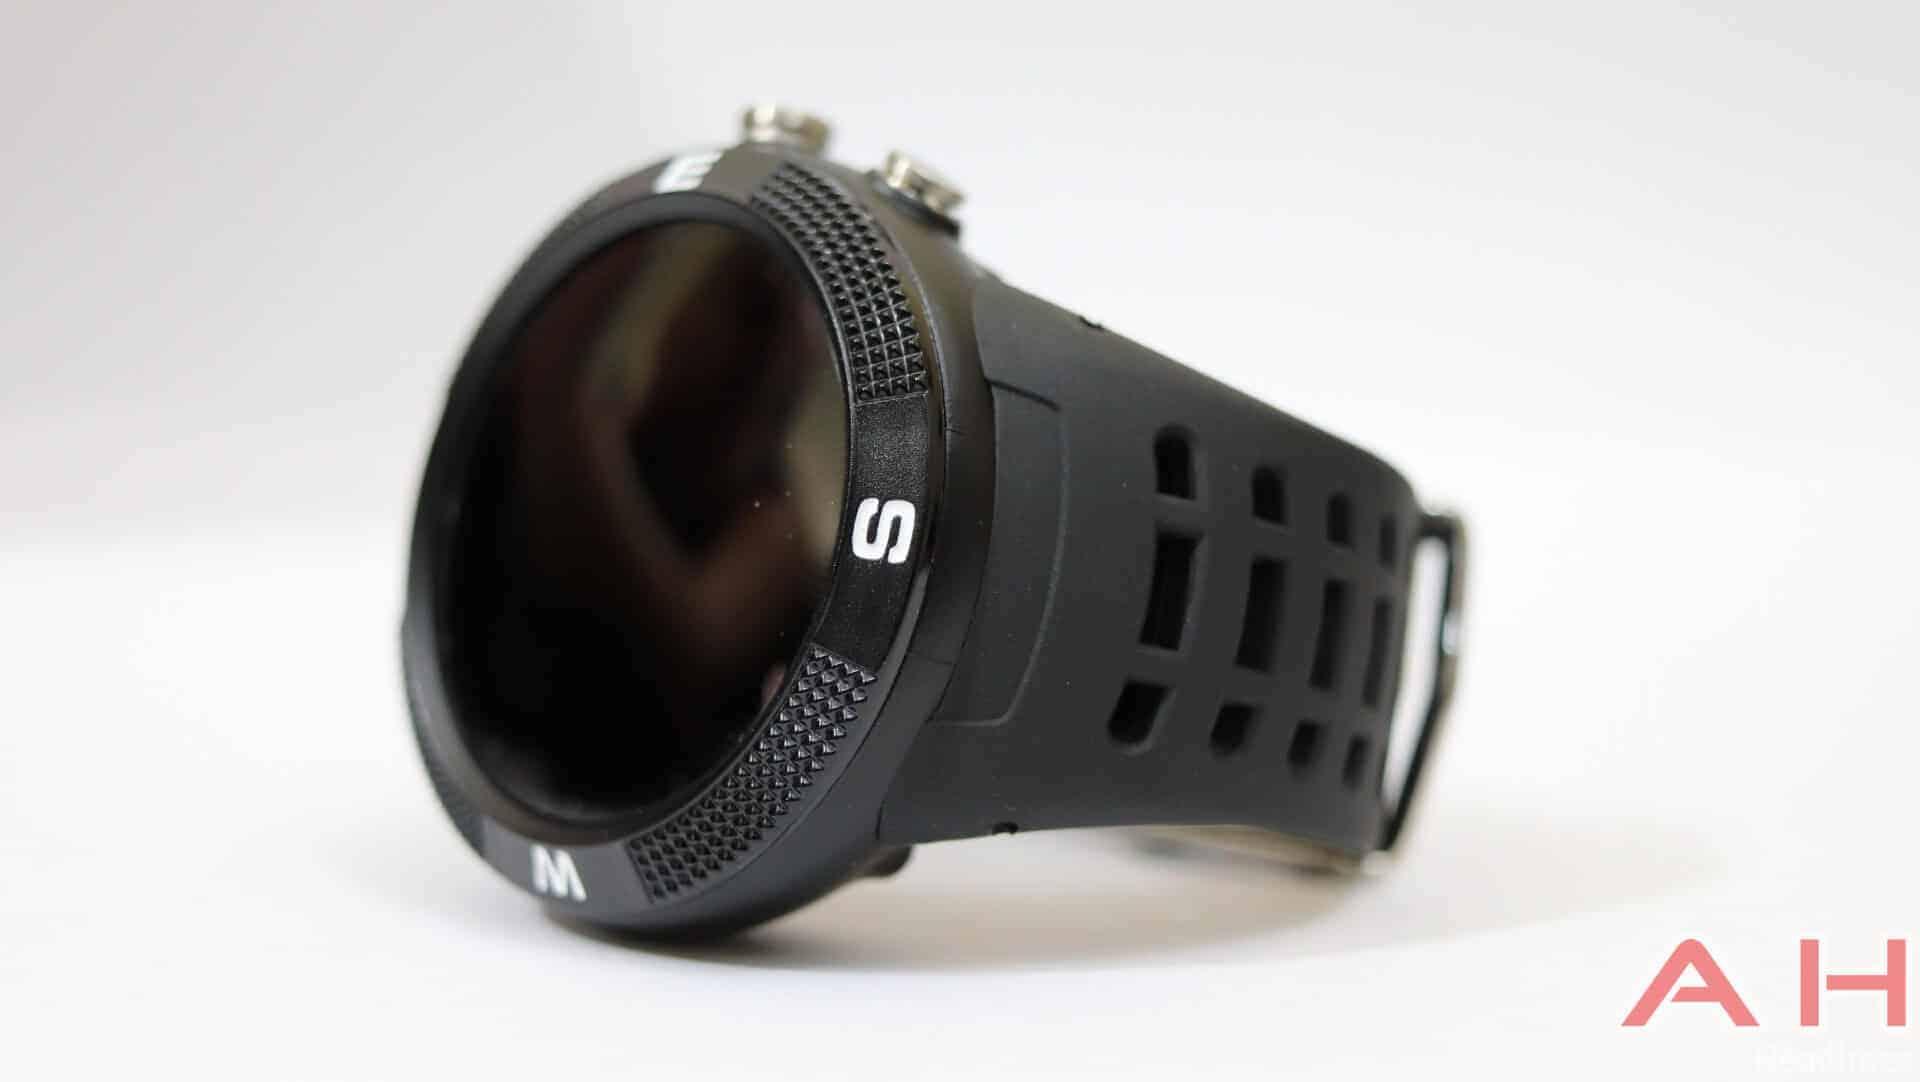 No 1 F18 Review Hardware AH 02